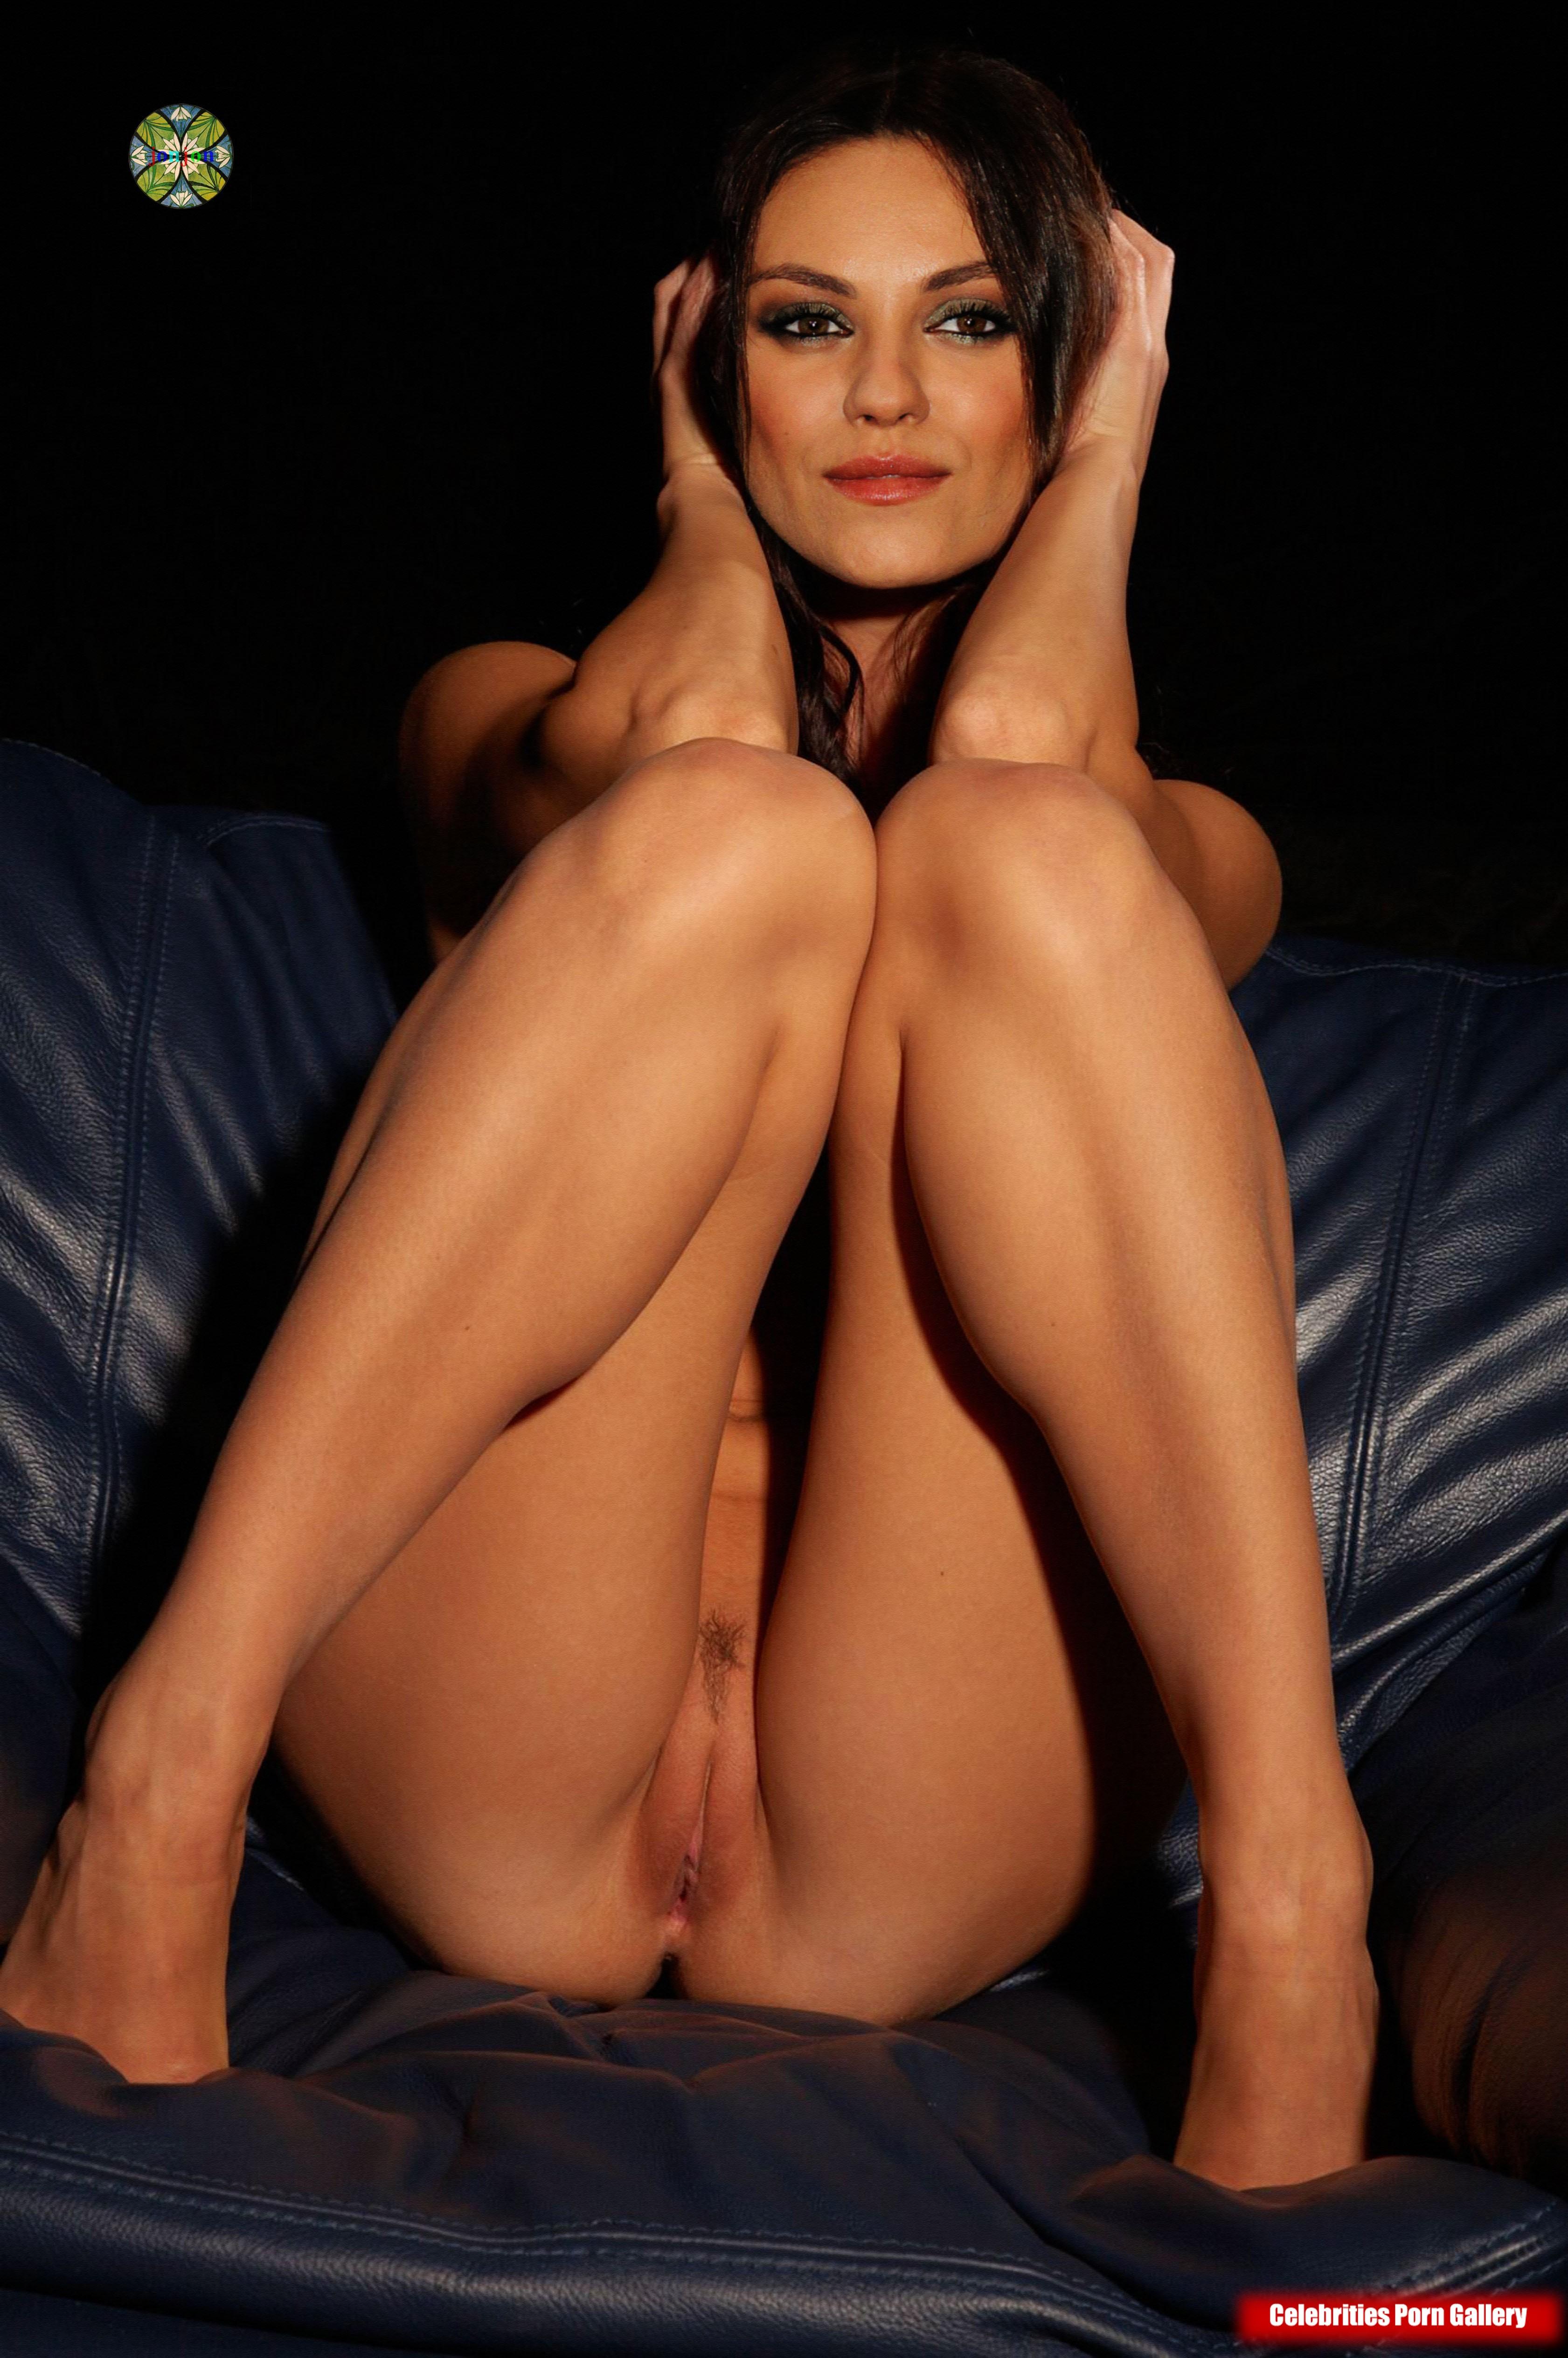 Mila Kunis Erotic